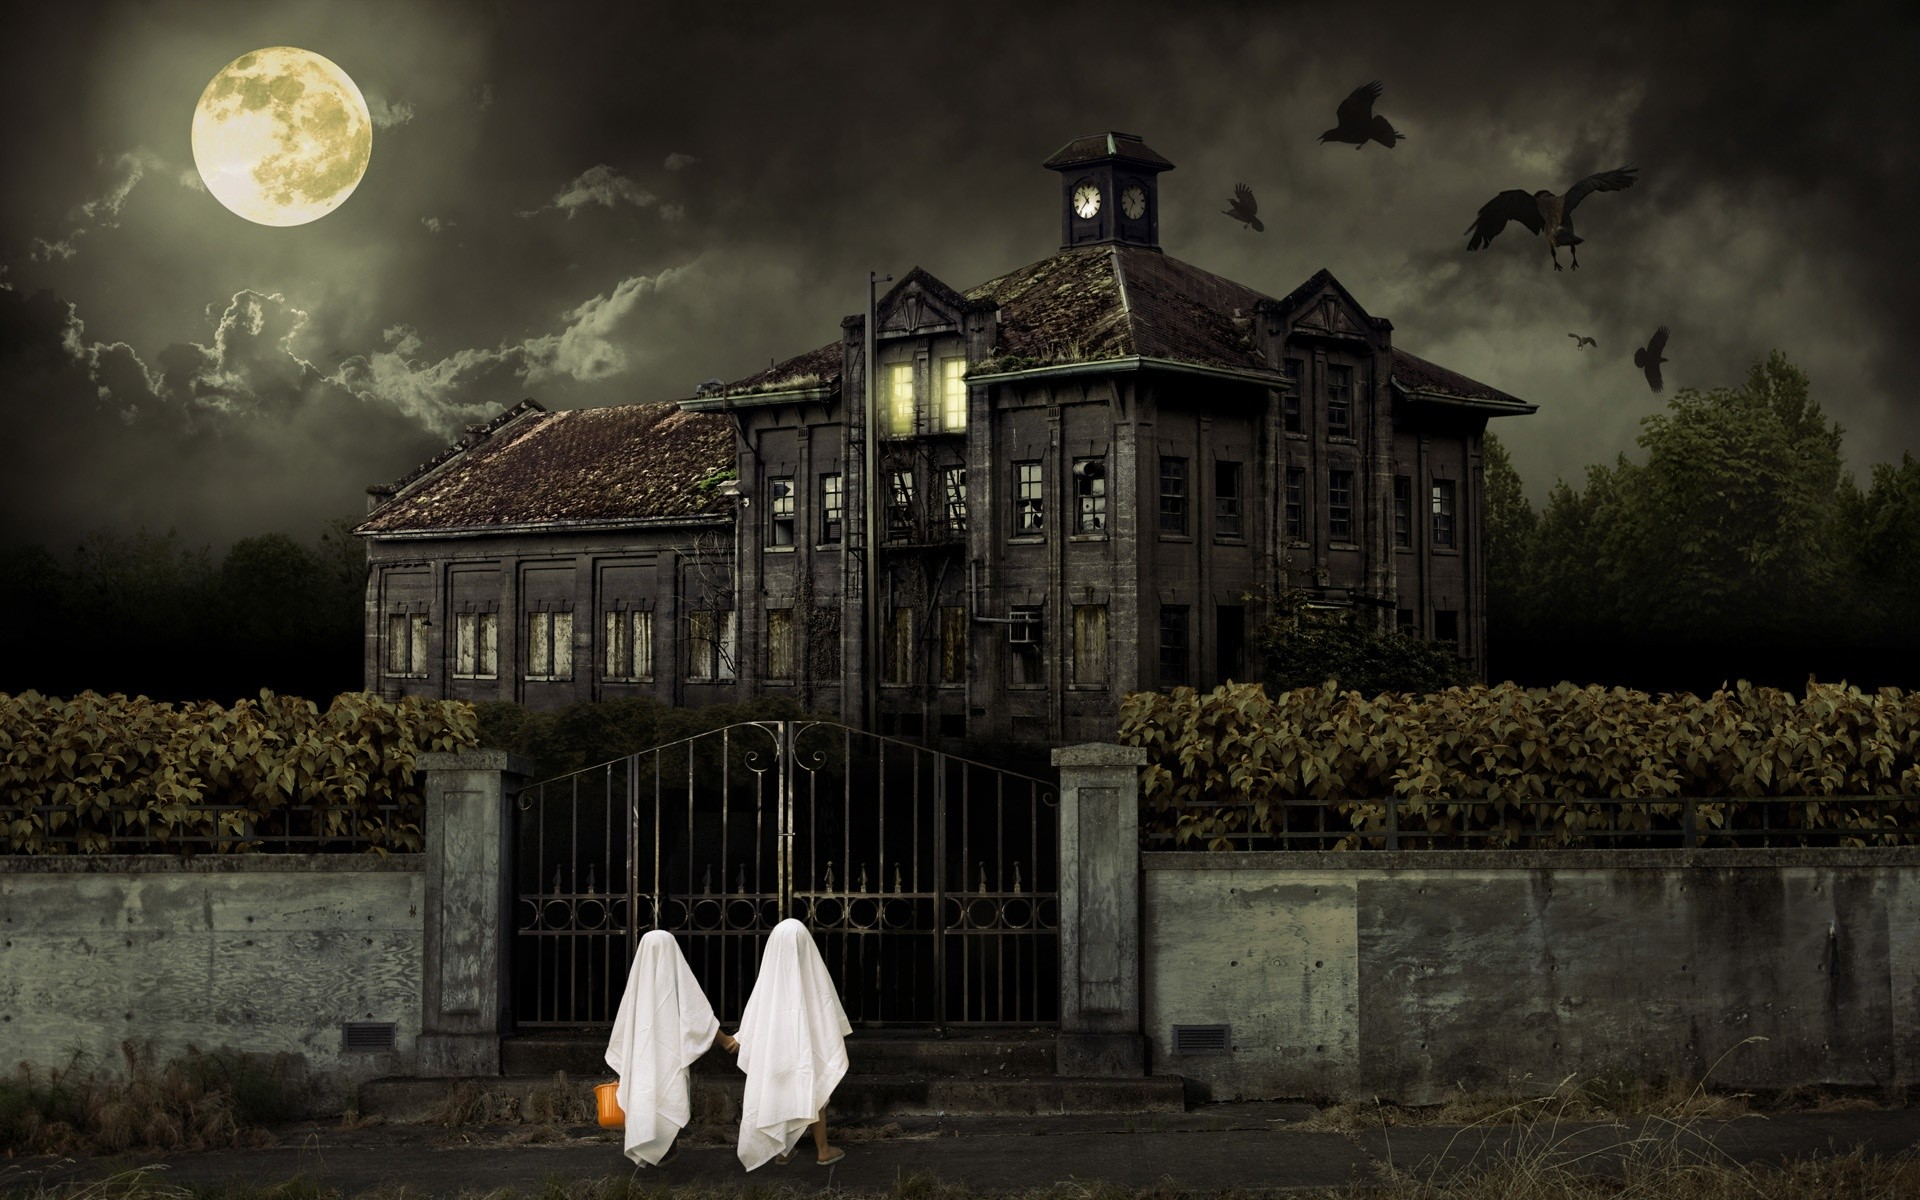 haunted house wallpaper 37634 haunted house haunted house wallpaper 1920x1200